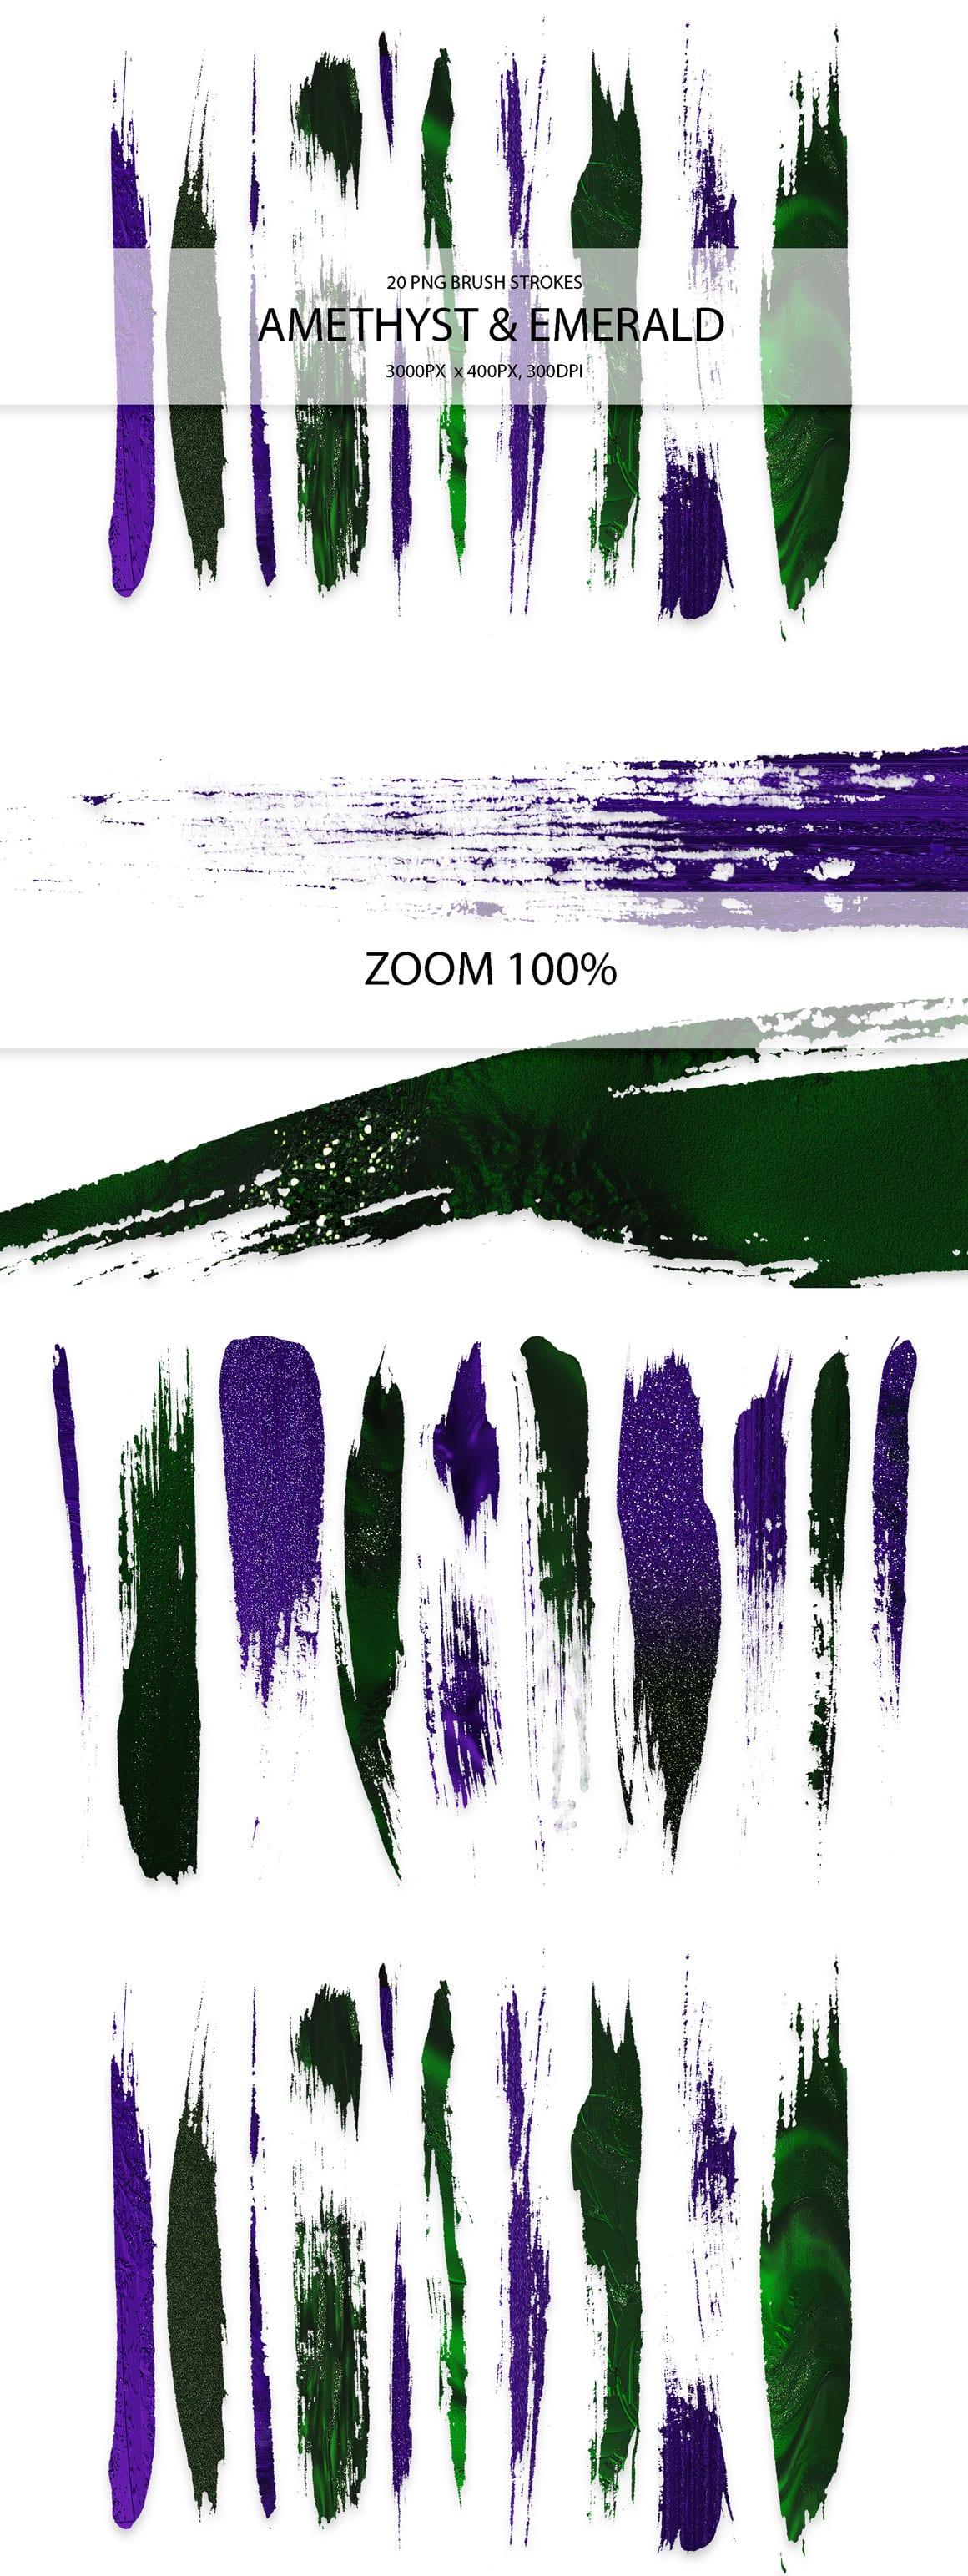 829 Acrylic Brush Strokes and Digital Brush Strokes - $9 - AmethystEmeraldStrokes 01 min